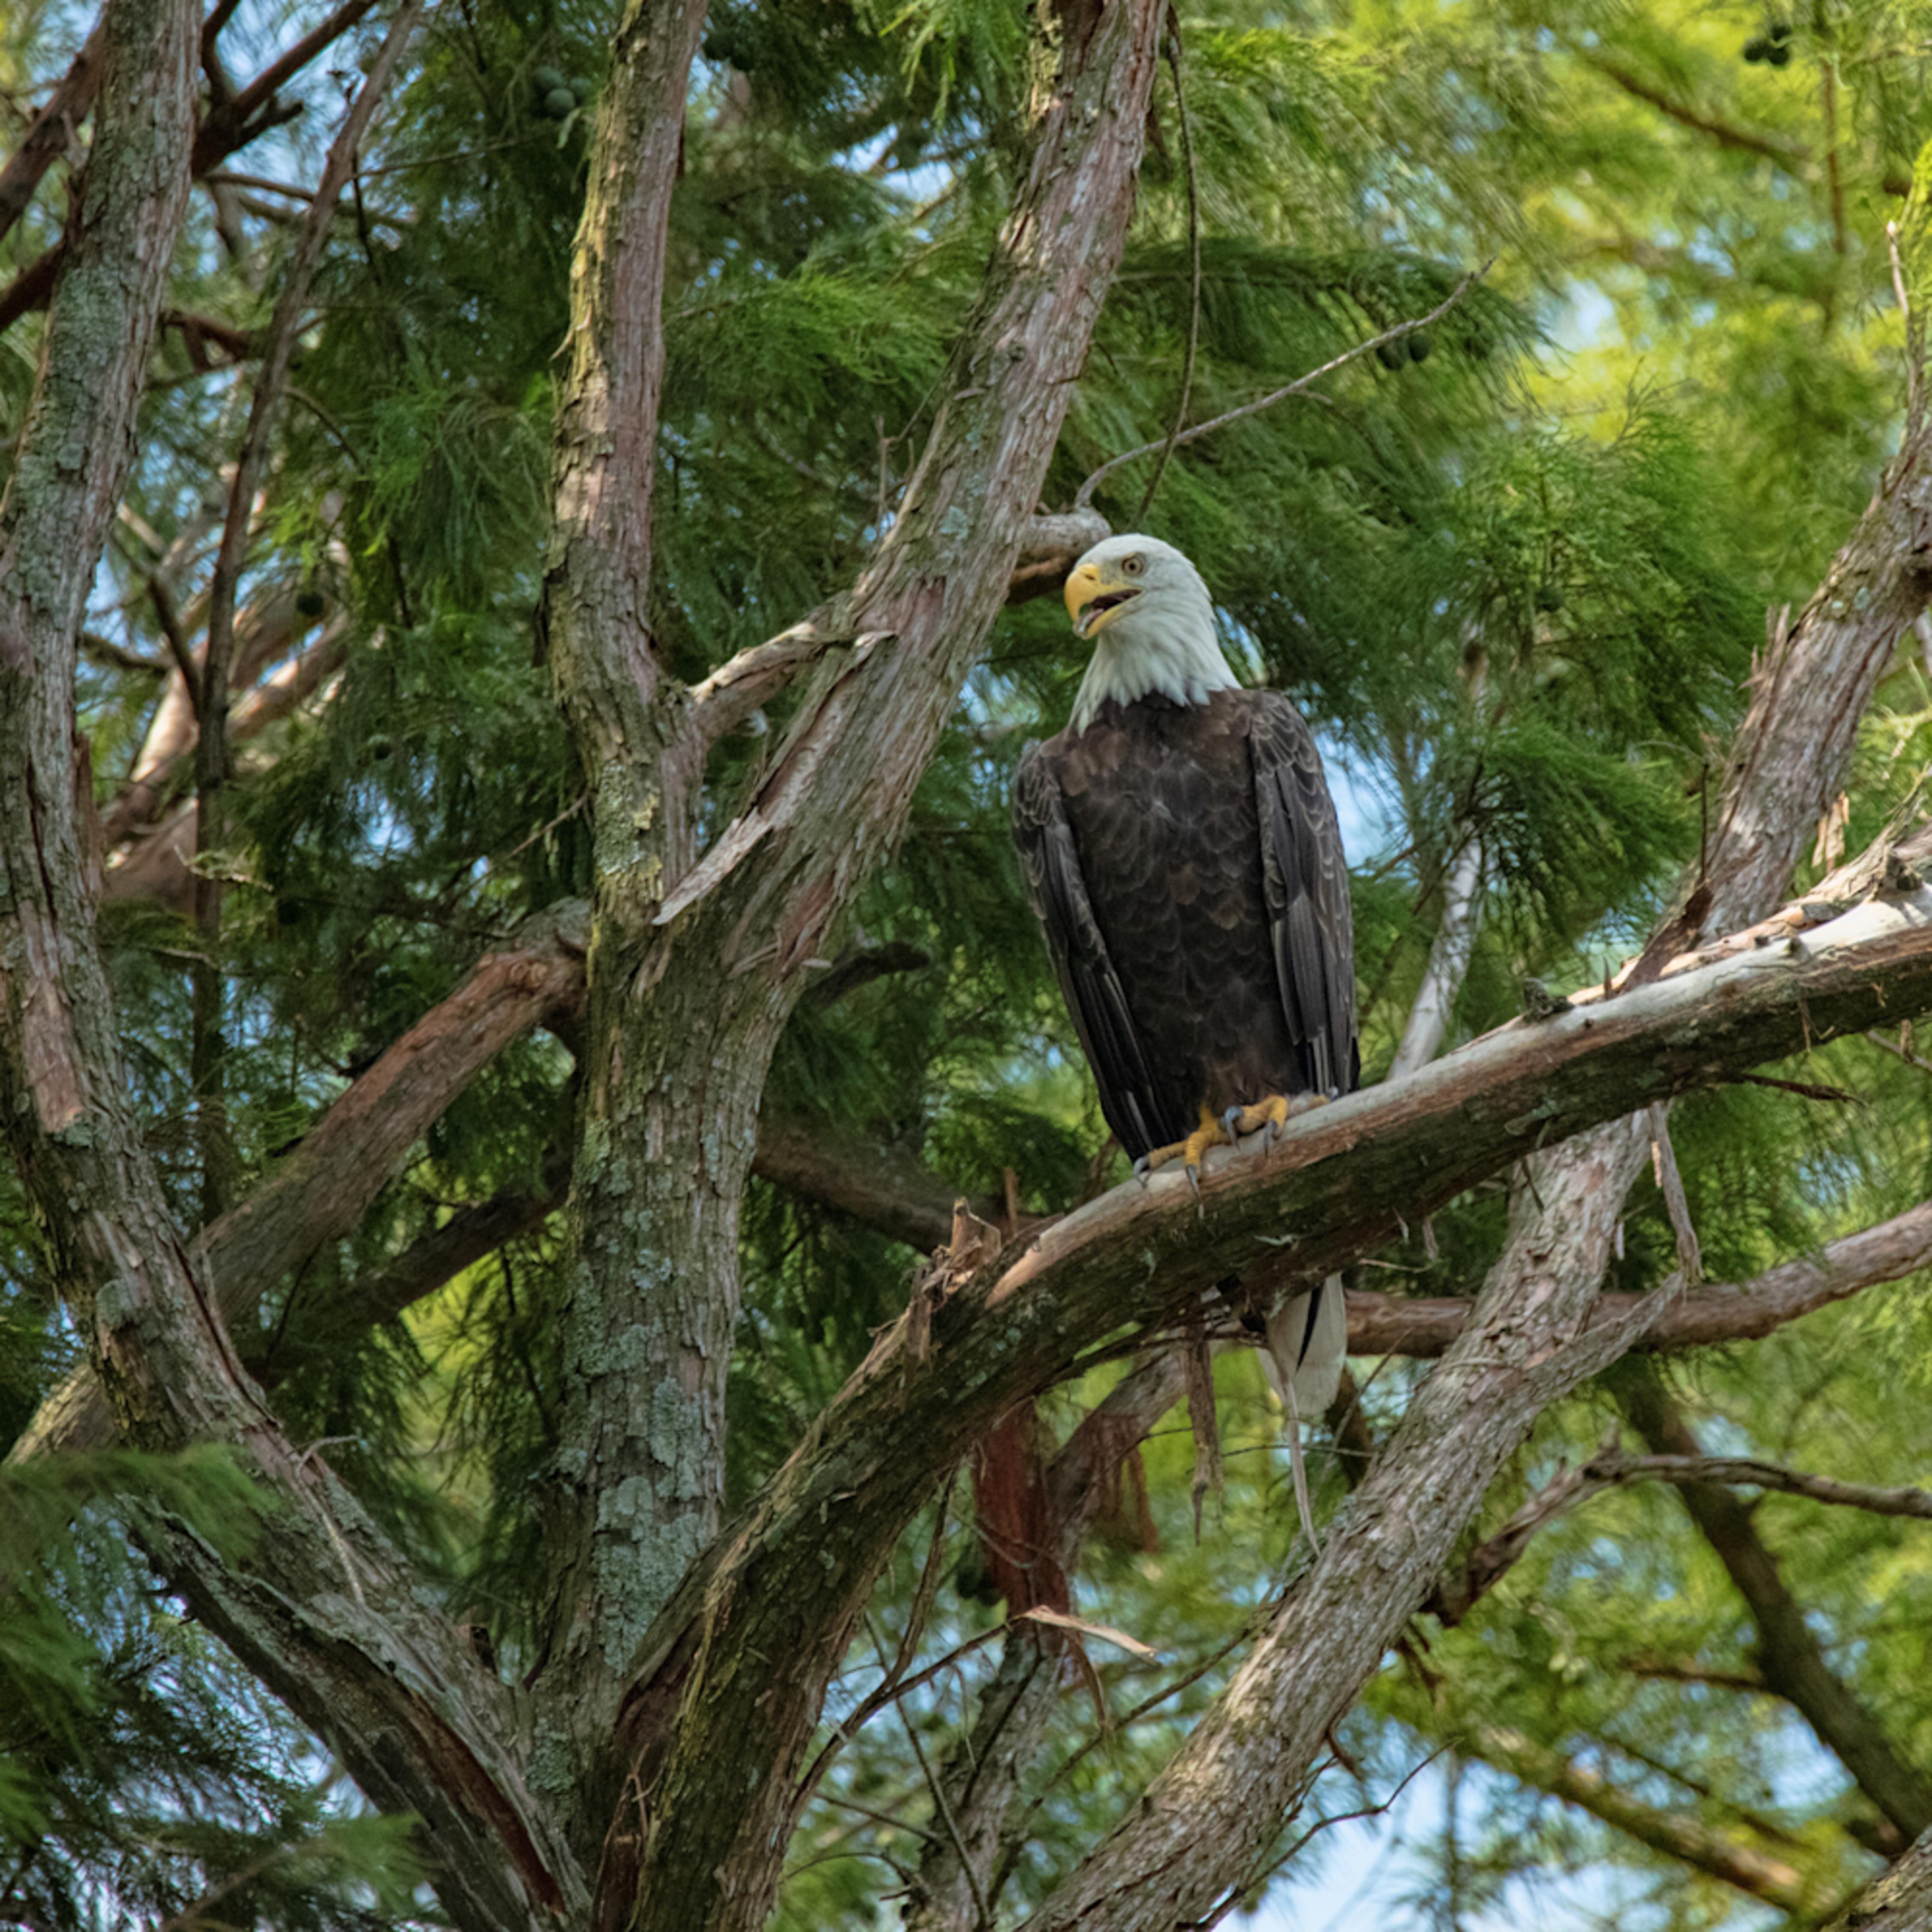 Bald eagle tree 9174 fss tspjys